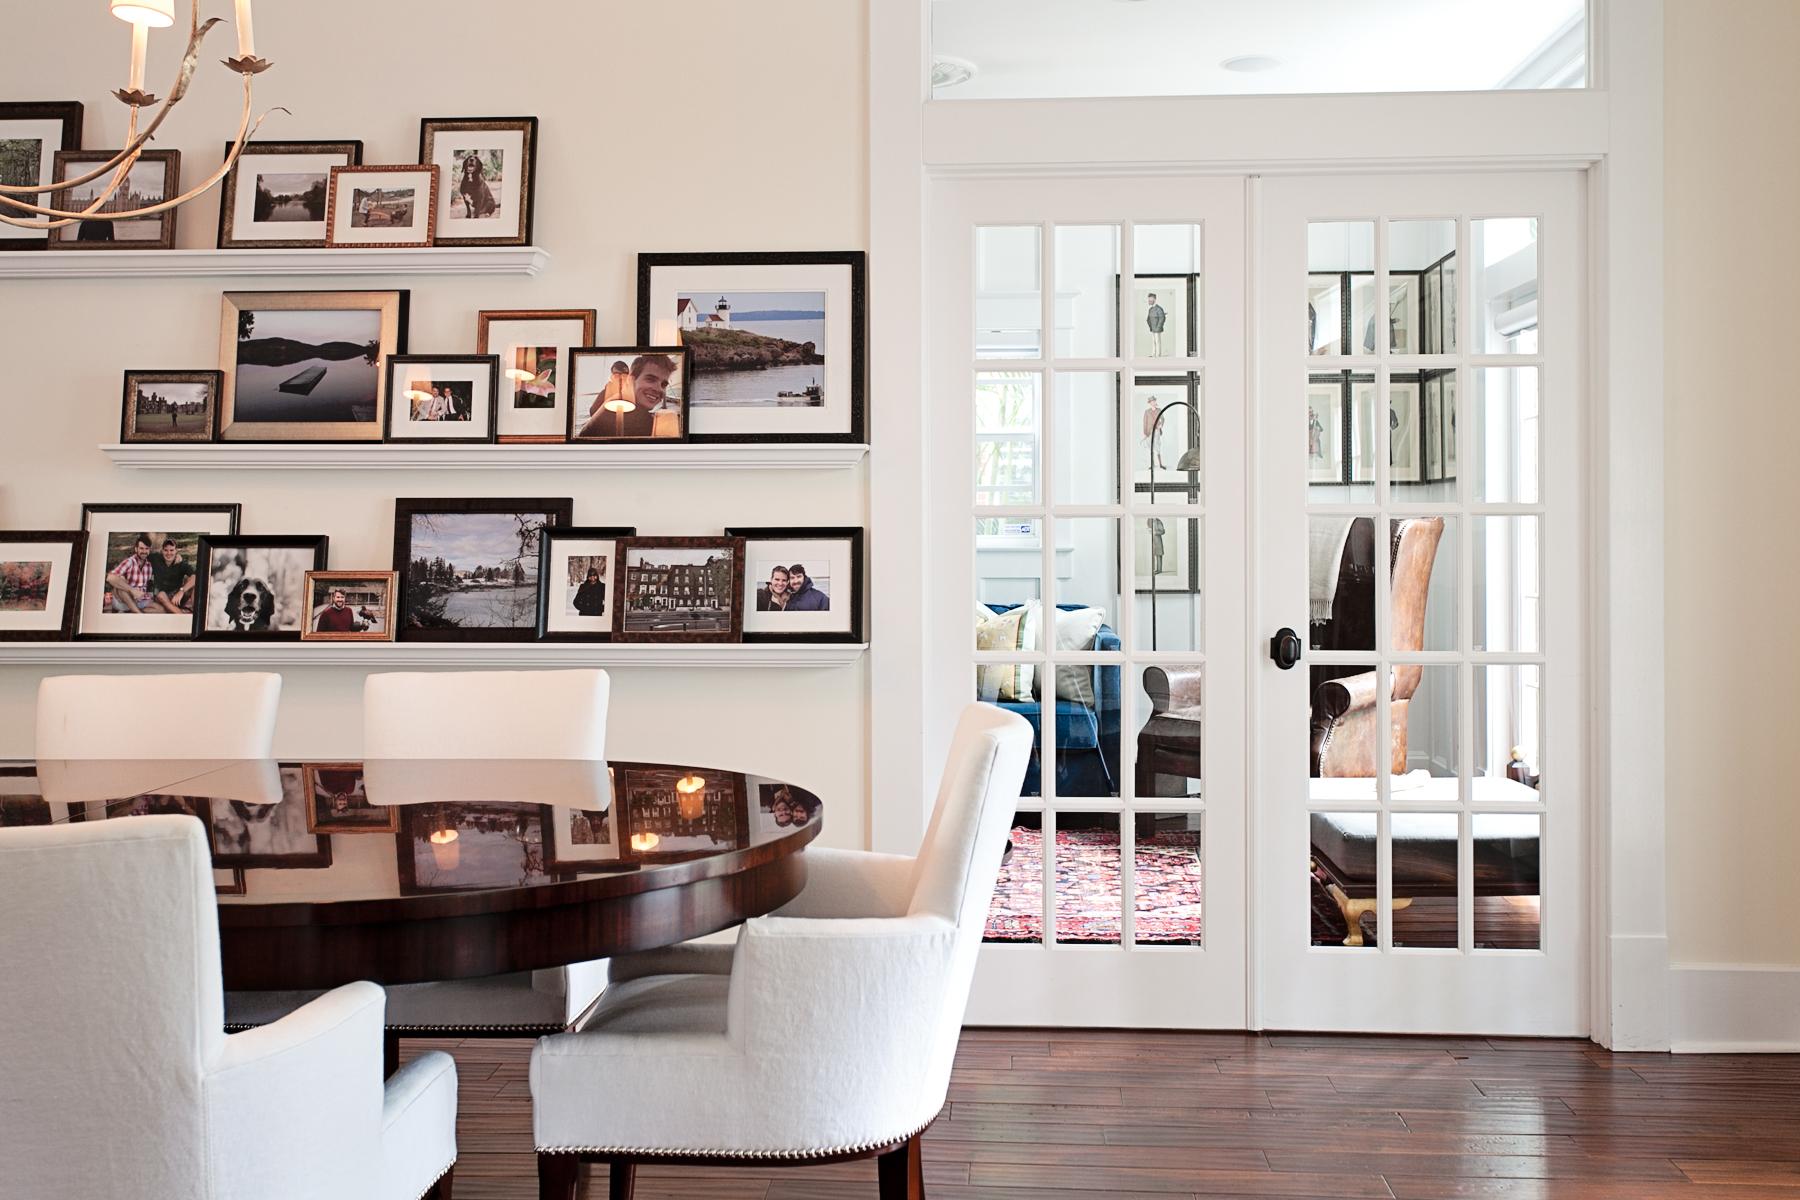 luxury_interiordesign_lisagilmoredesign10